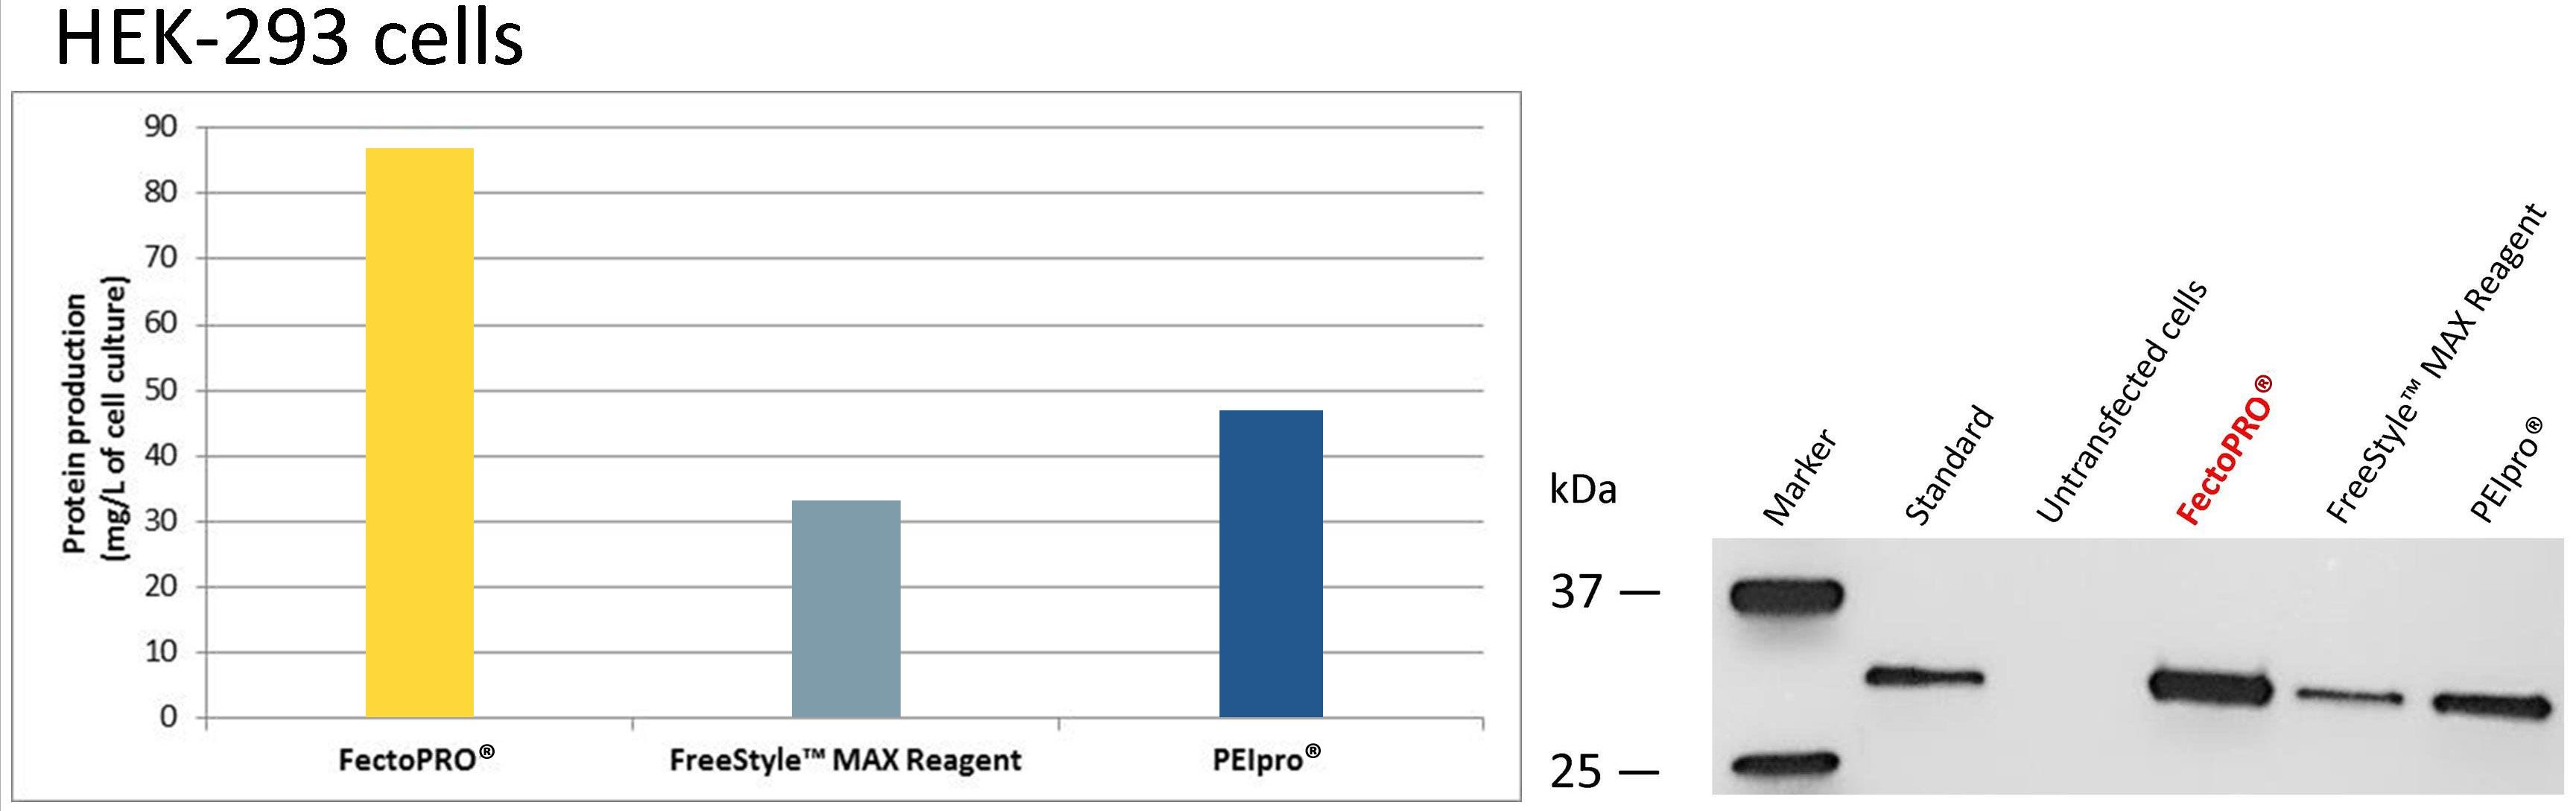 FectoPRO - HEK-293F cells